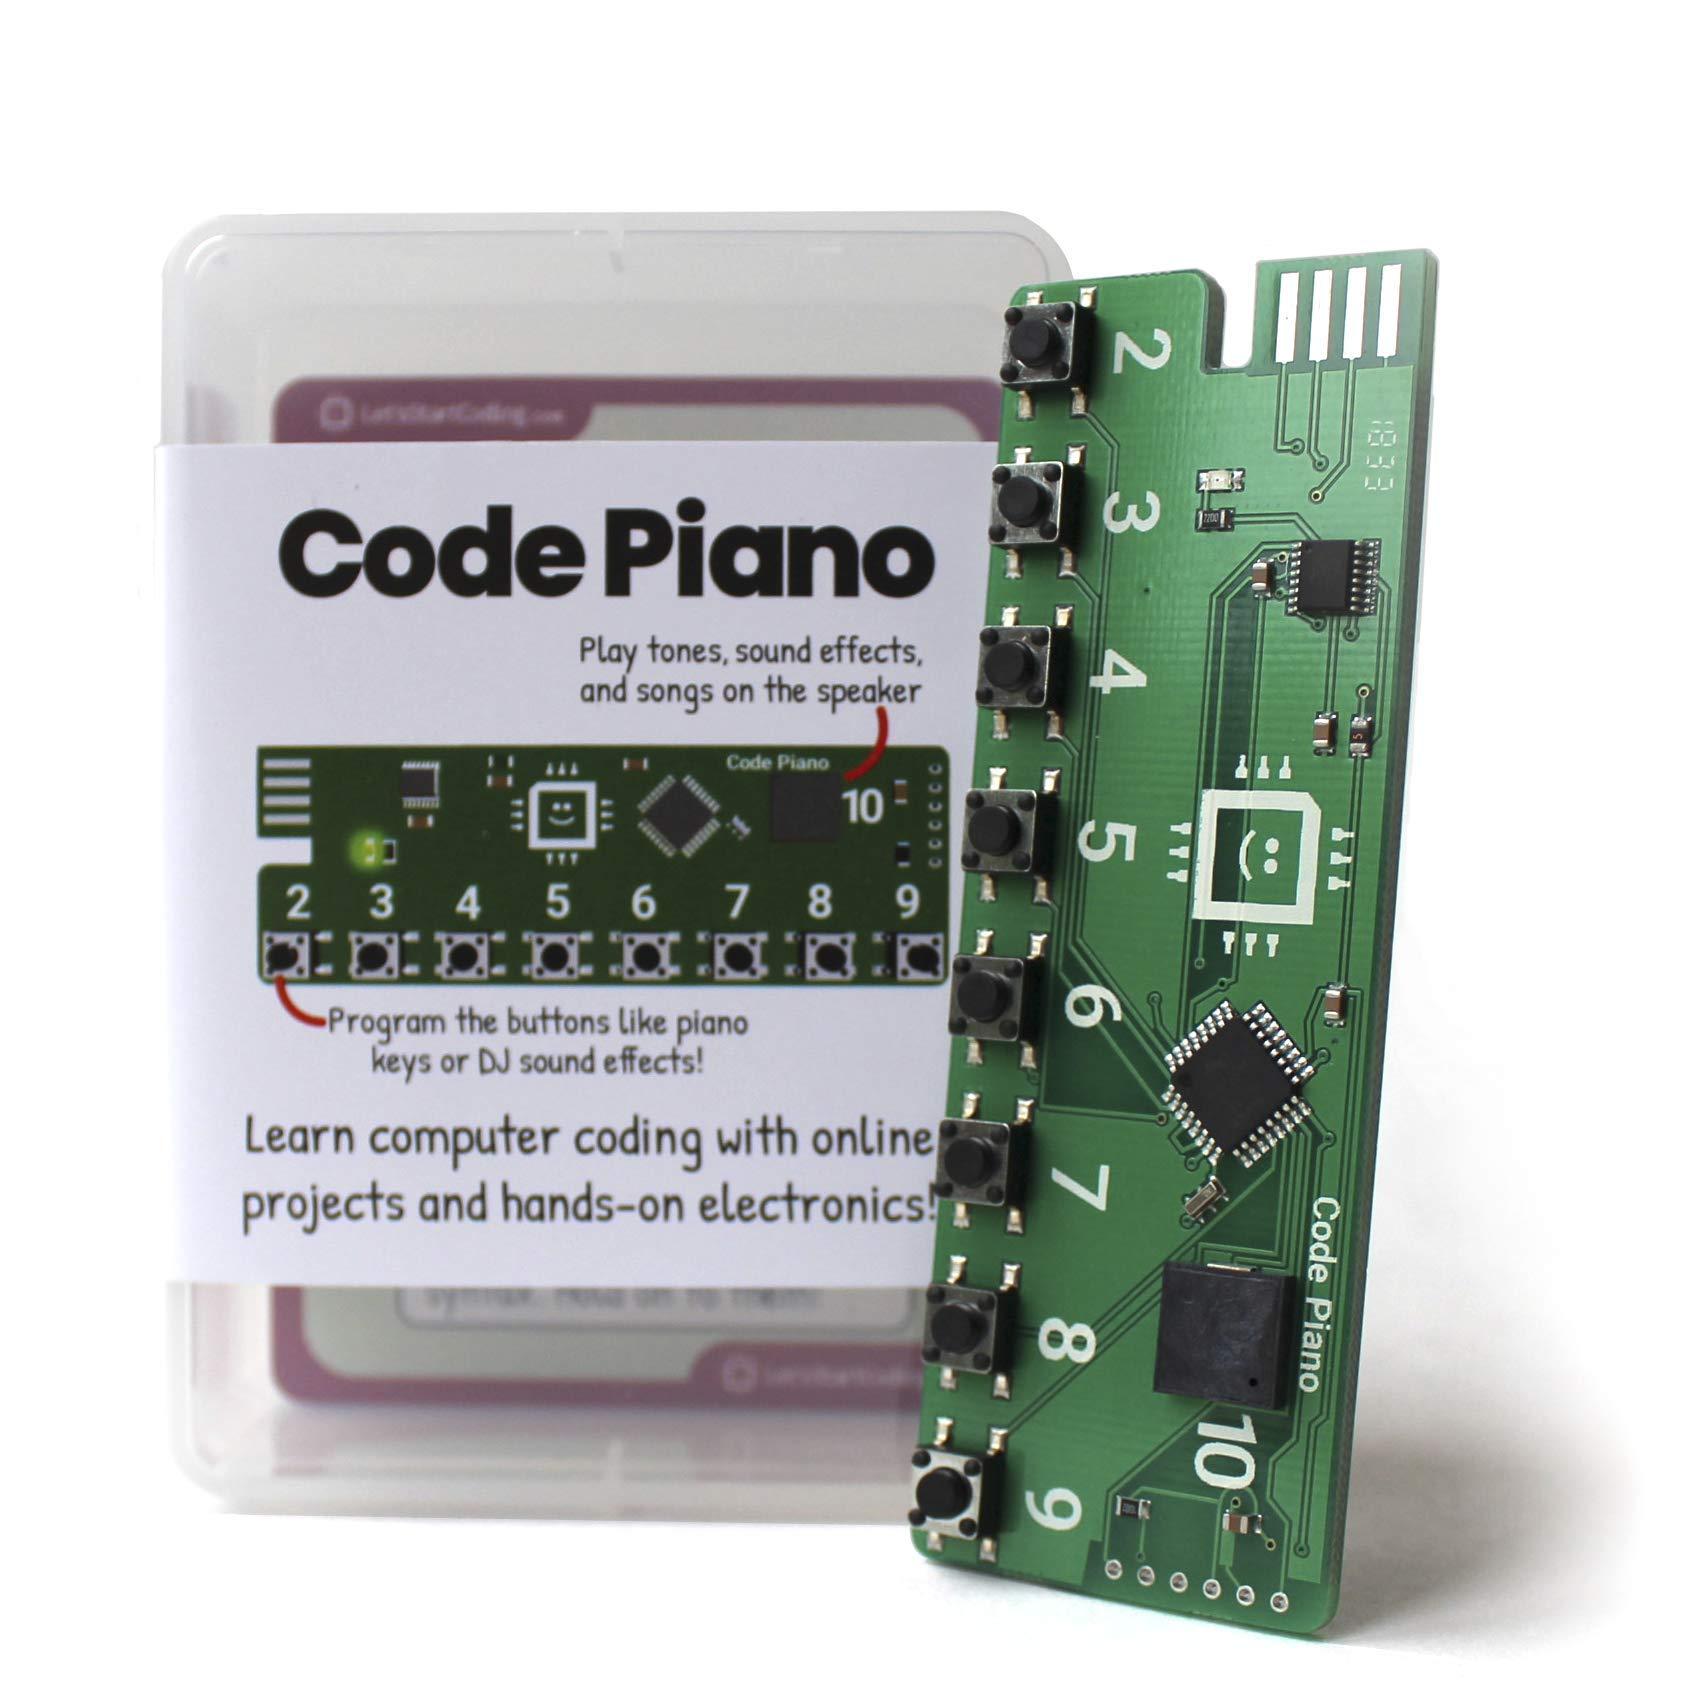 Bundle: Ultimate Kit + Car + Rocket + Piano + Speaker | Coding Kits for Kids 8-13 | Bundle and Save! by Let's Start Coding (Image #2)